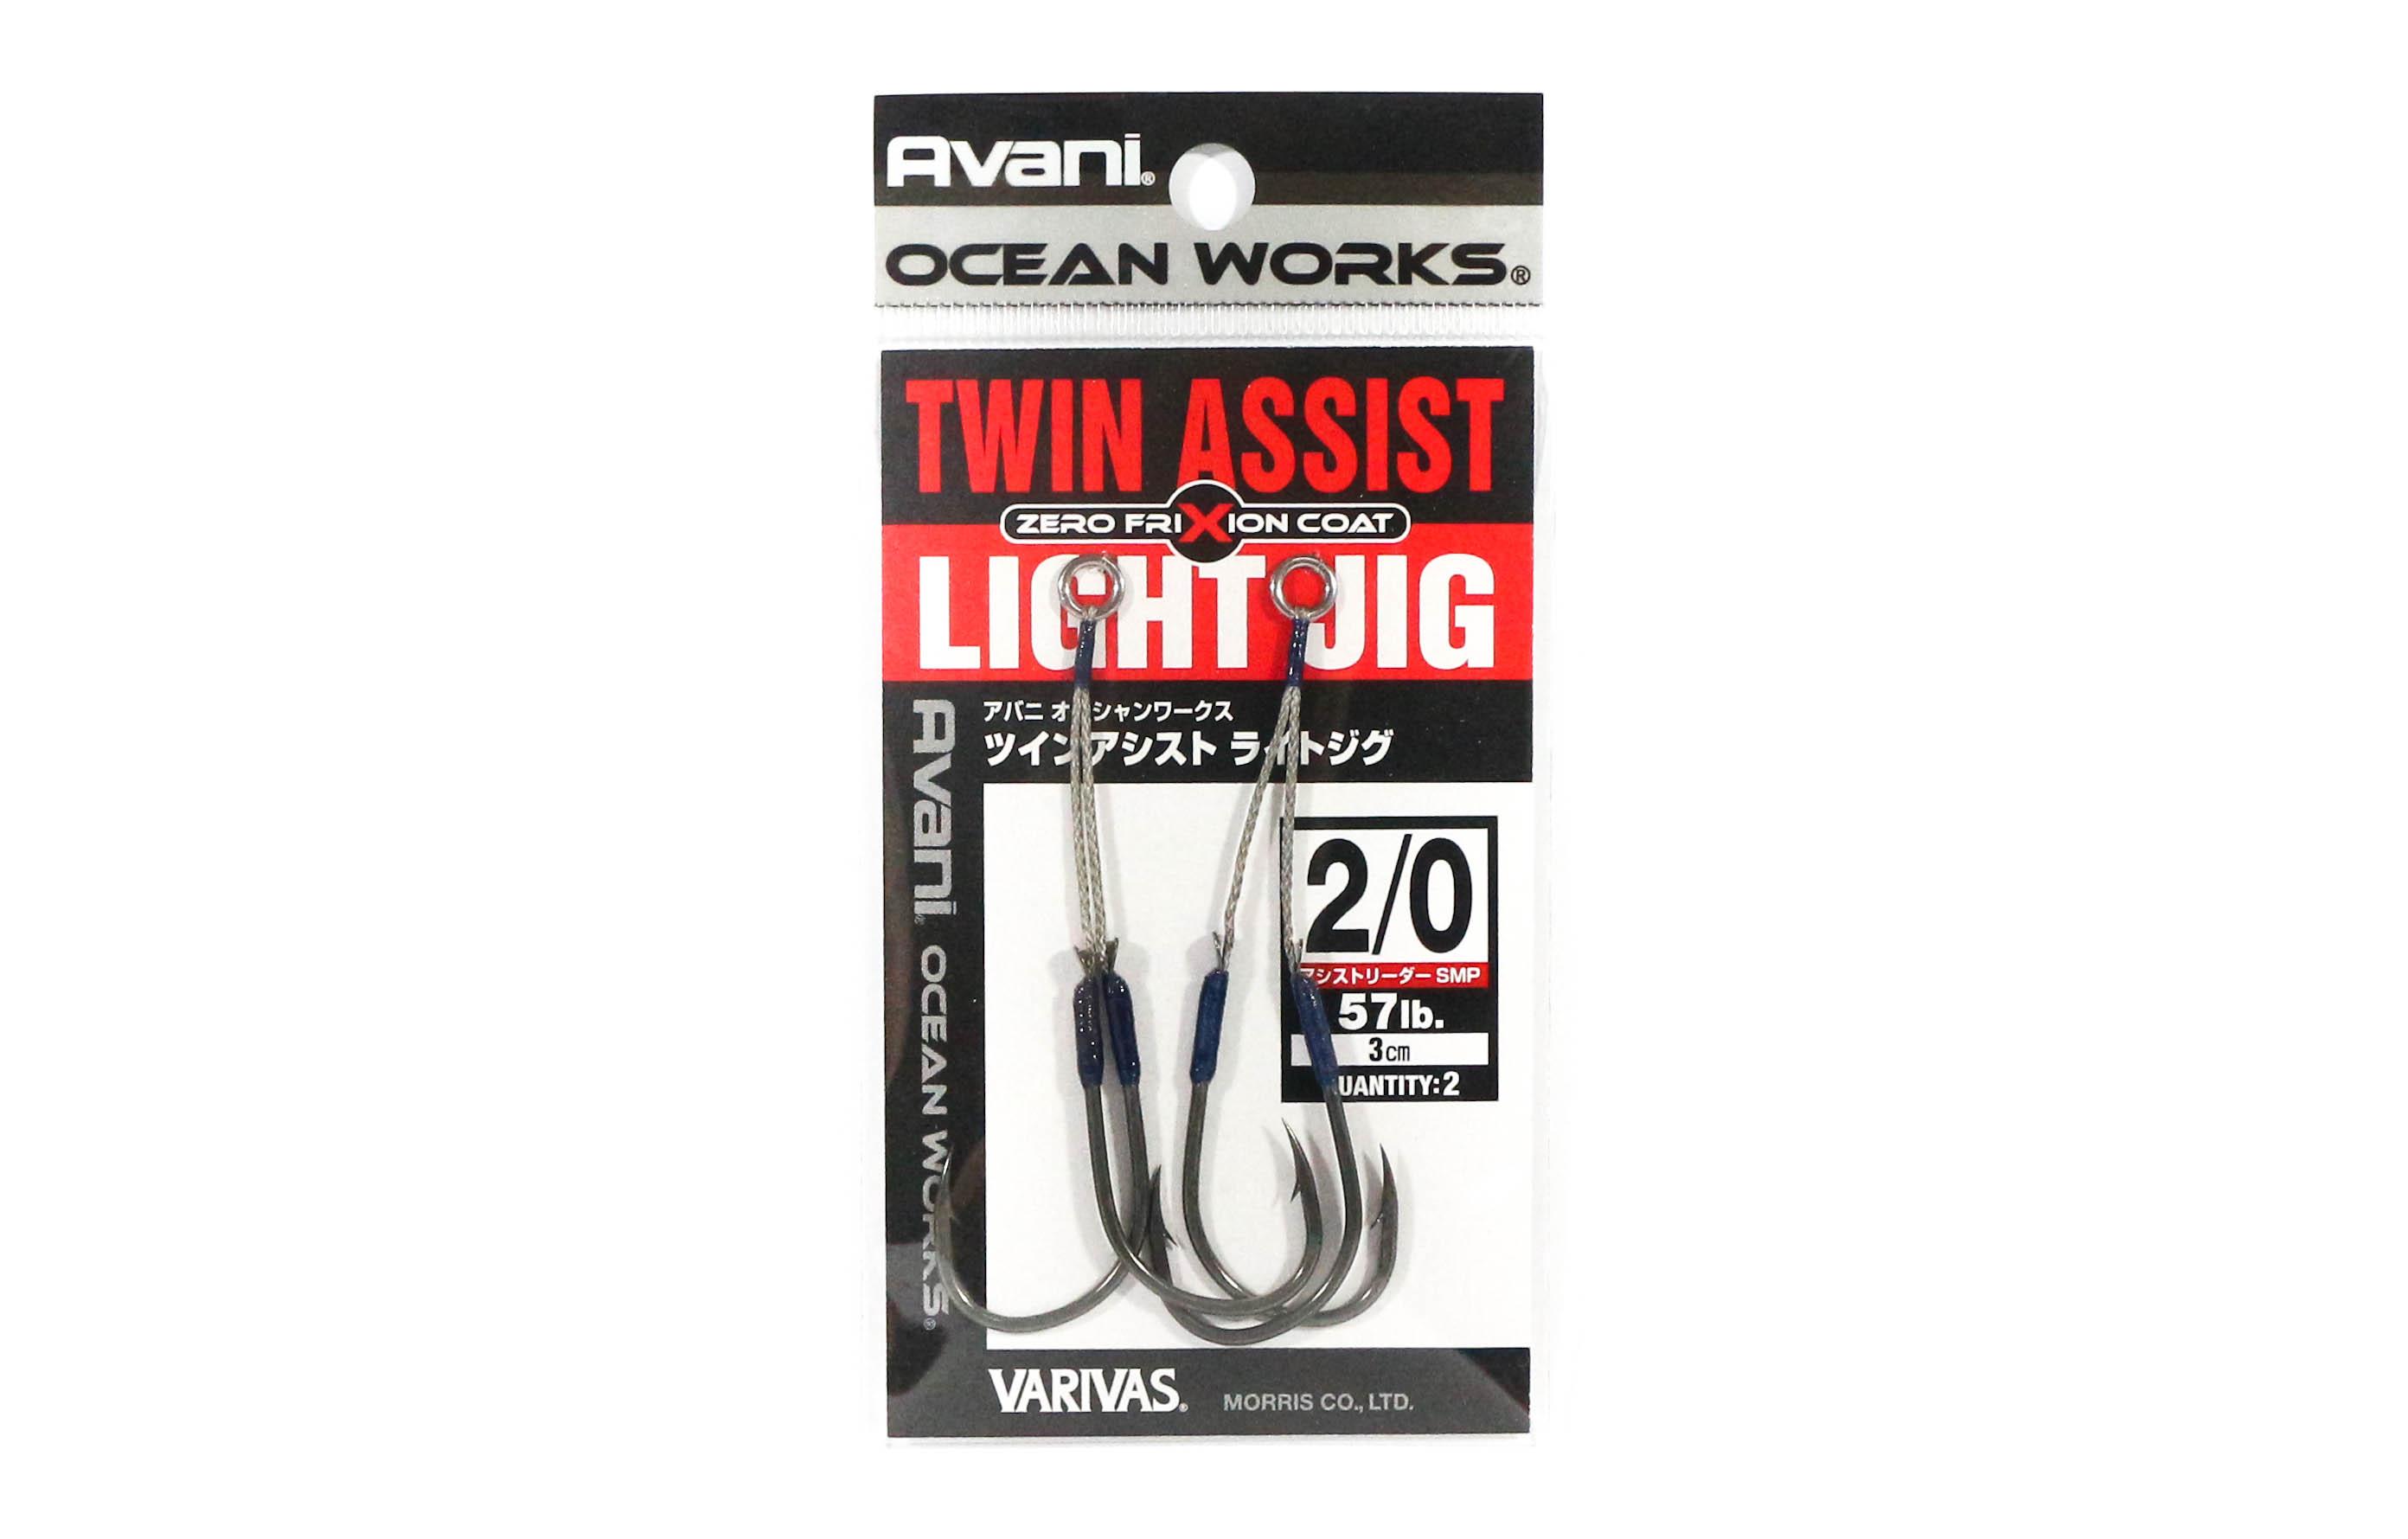 Varivas AH-64 Ocean Works Twin Assist Light Jig Size 2/0 - 3cm (4575)